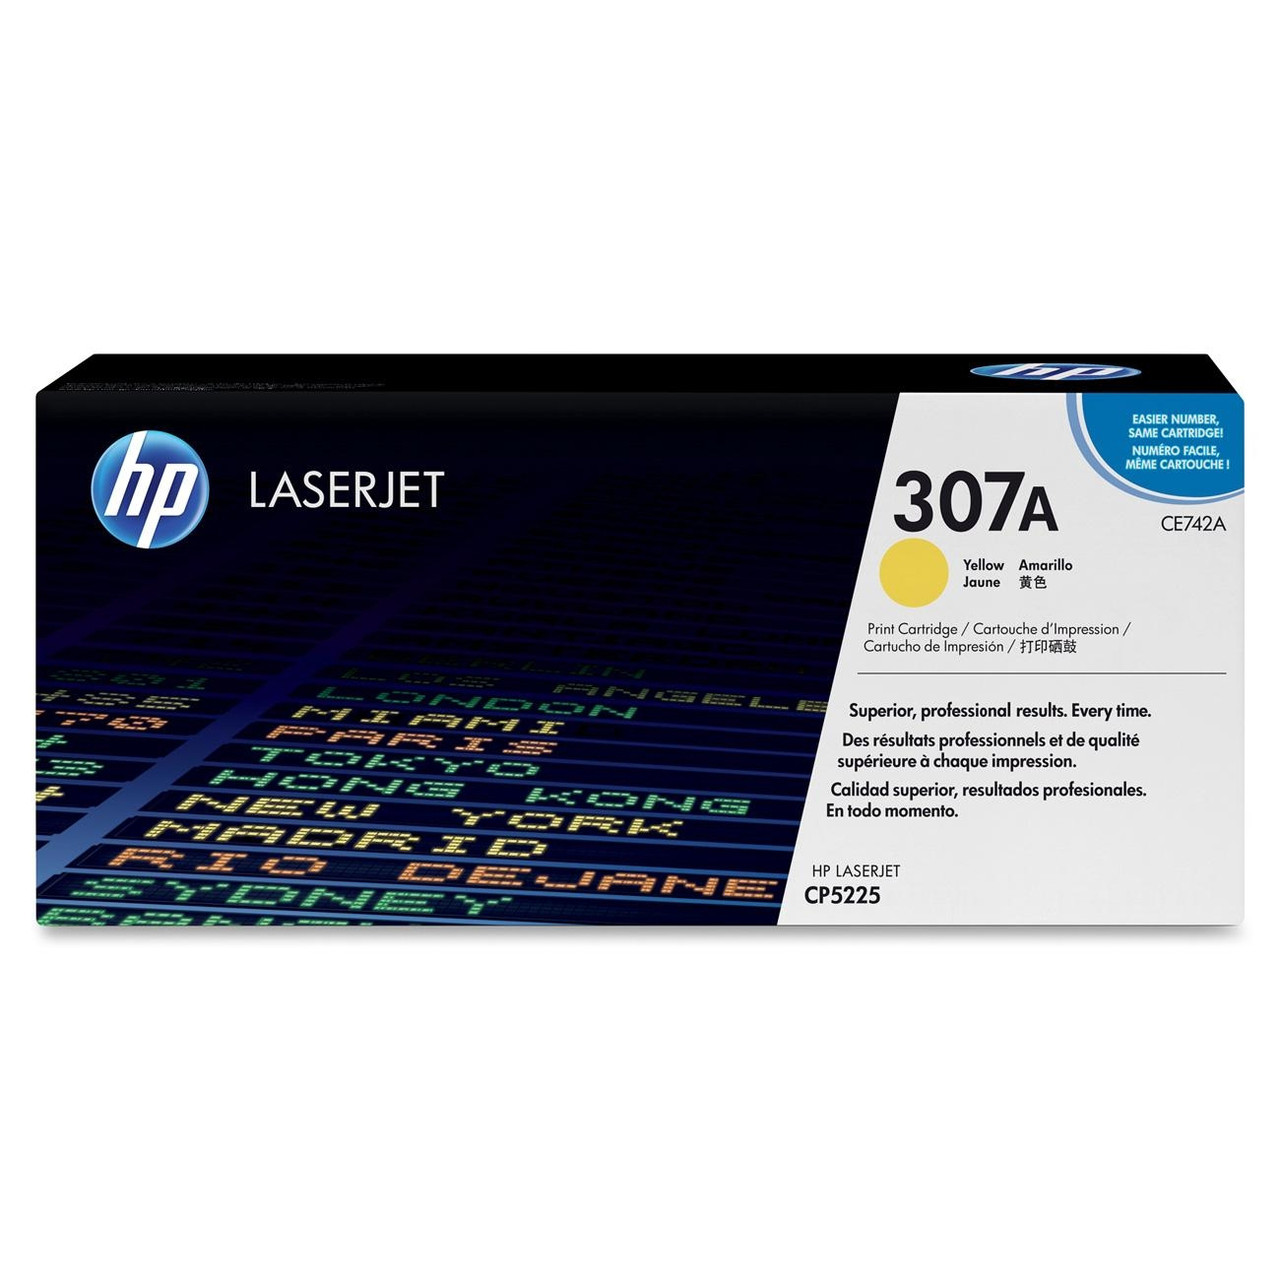 Картридж HP Laser/yellow CE742A